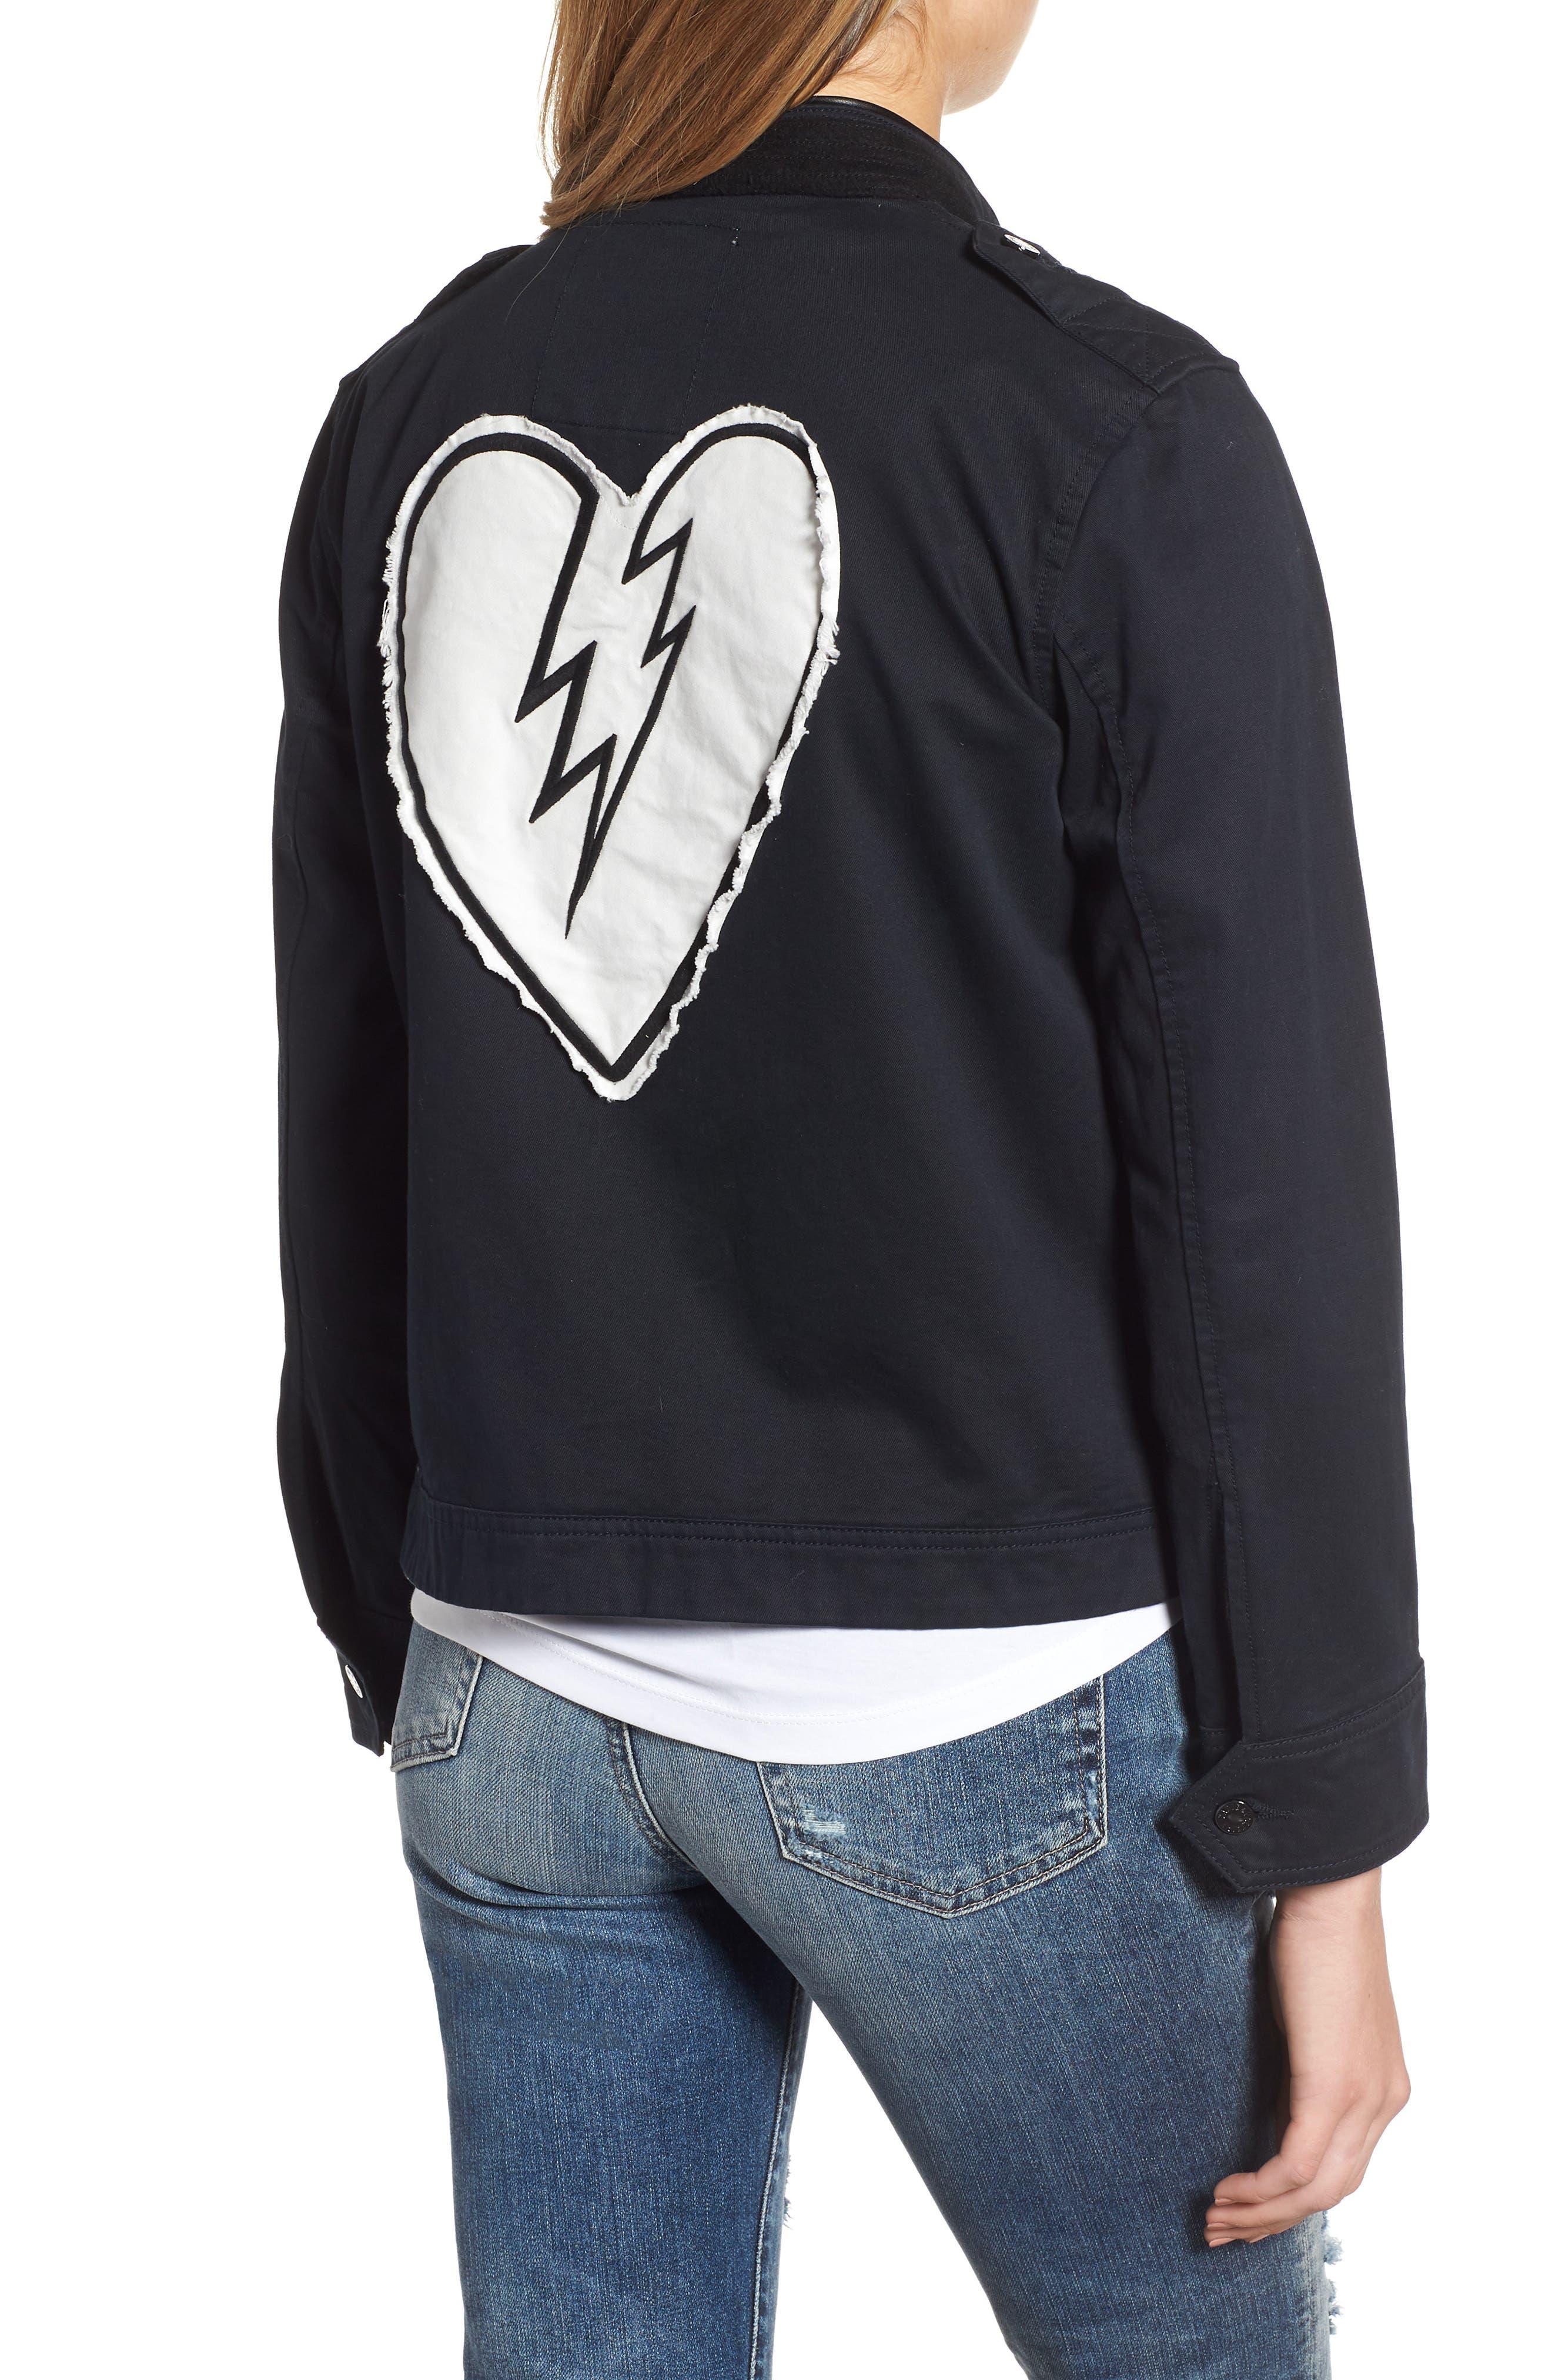 ZADIG & VOLTAIRE,                             Kavy Spi Embroidered Jacket,                             Alternate thumbnail 2, color,                             001